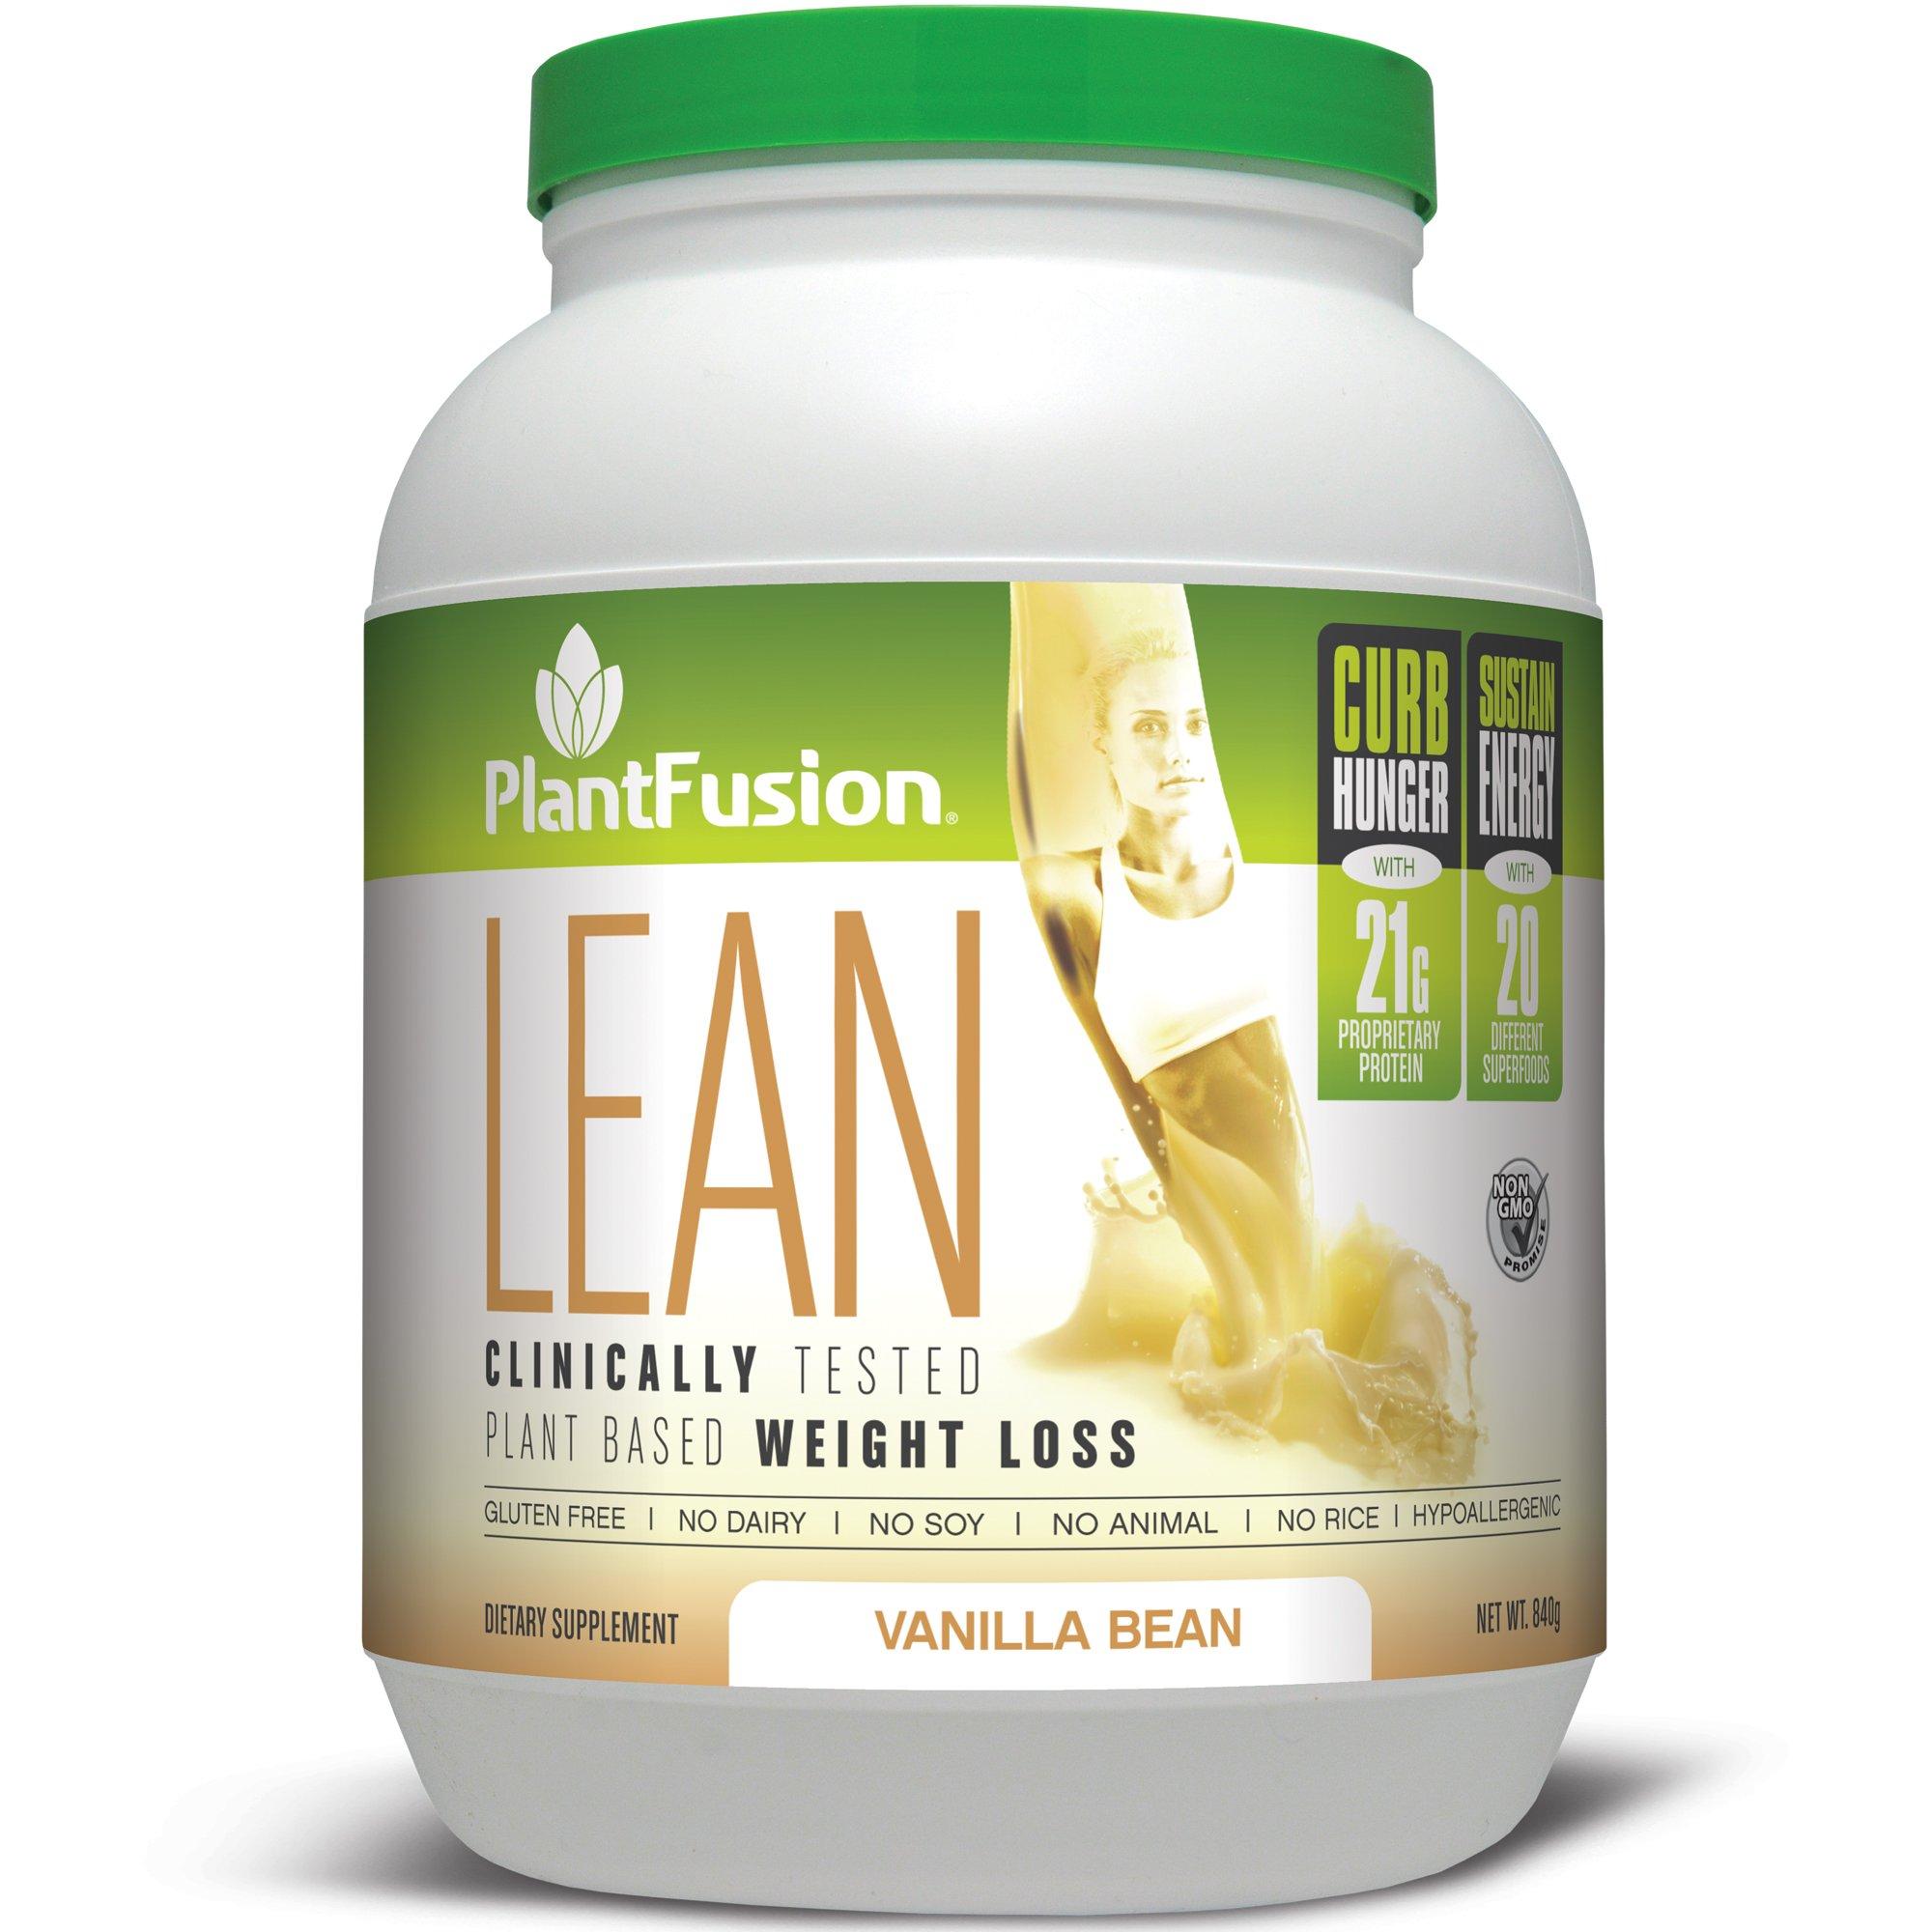 PlantFusion Lean Plant Based Weight Loss Protein Powder, Vanilla Bean, 29.06 oz Tub, 20 Servings, 1 Count, Gluten Free, Vegan, Non-GMO by PlantFusion